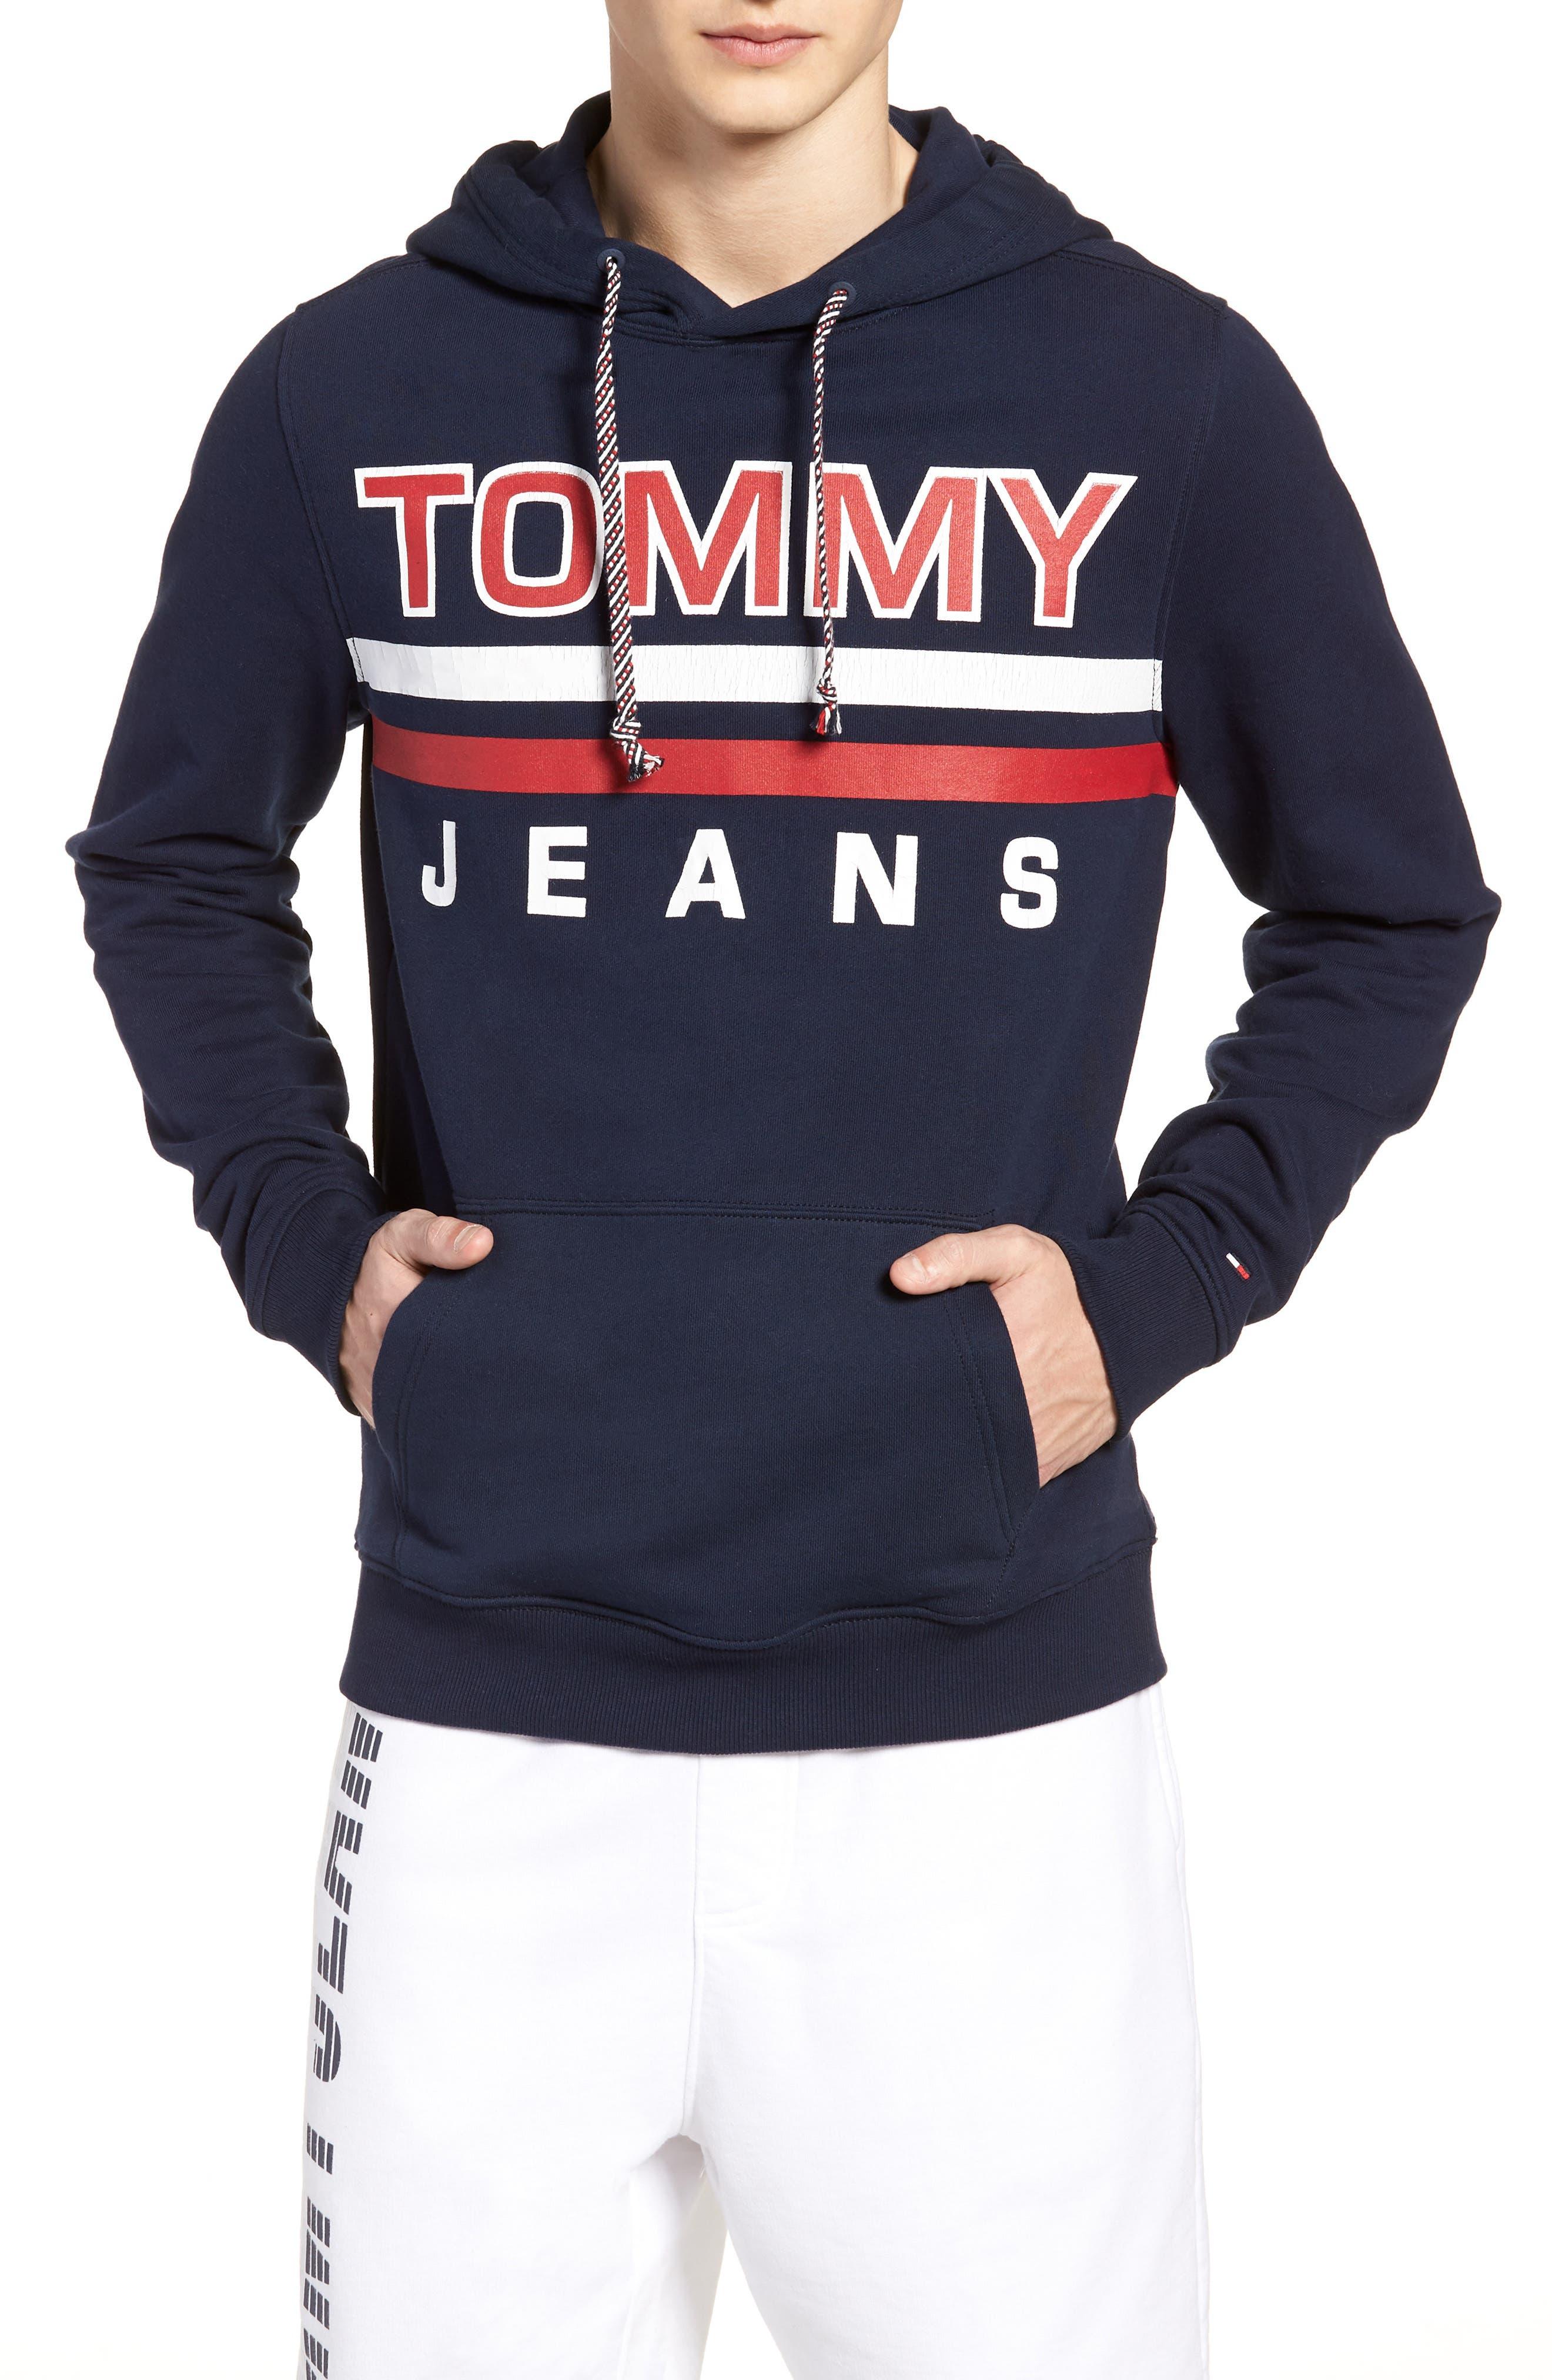 Alternate Image 1 Selected - TOMMY JEANS Essential Graphic Hoodie Sweatshirt